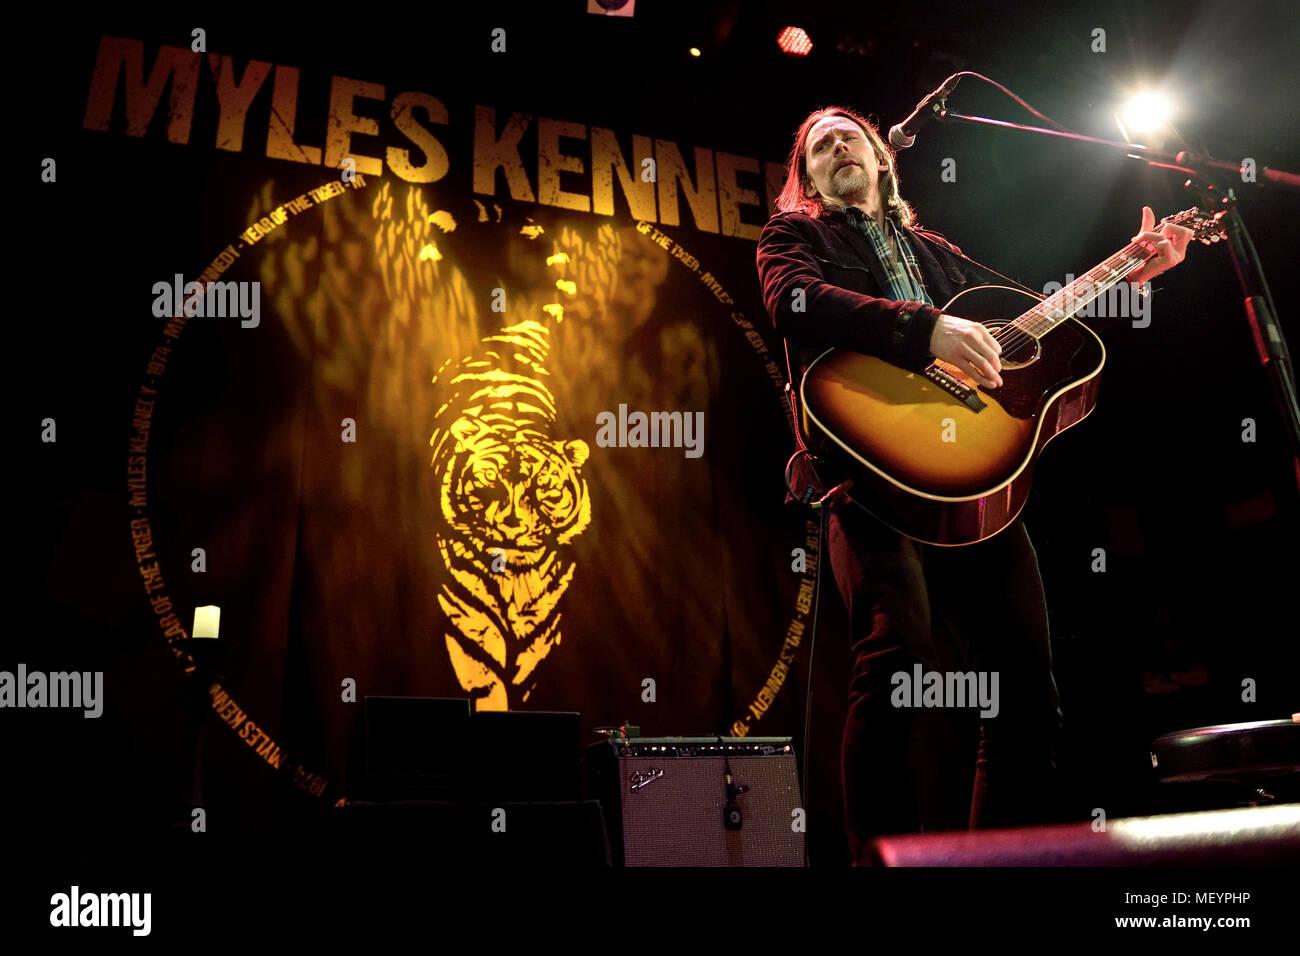 Myles Kennedy Acoustic gig, Jahr des Tigers Tour an der Islington ...